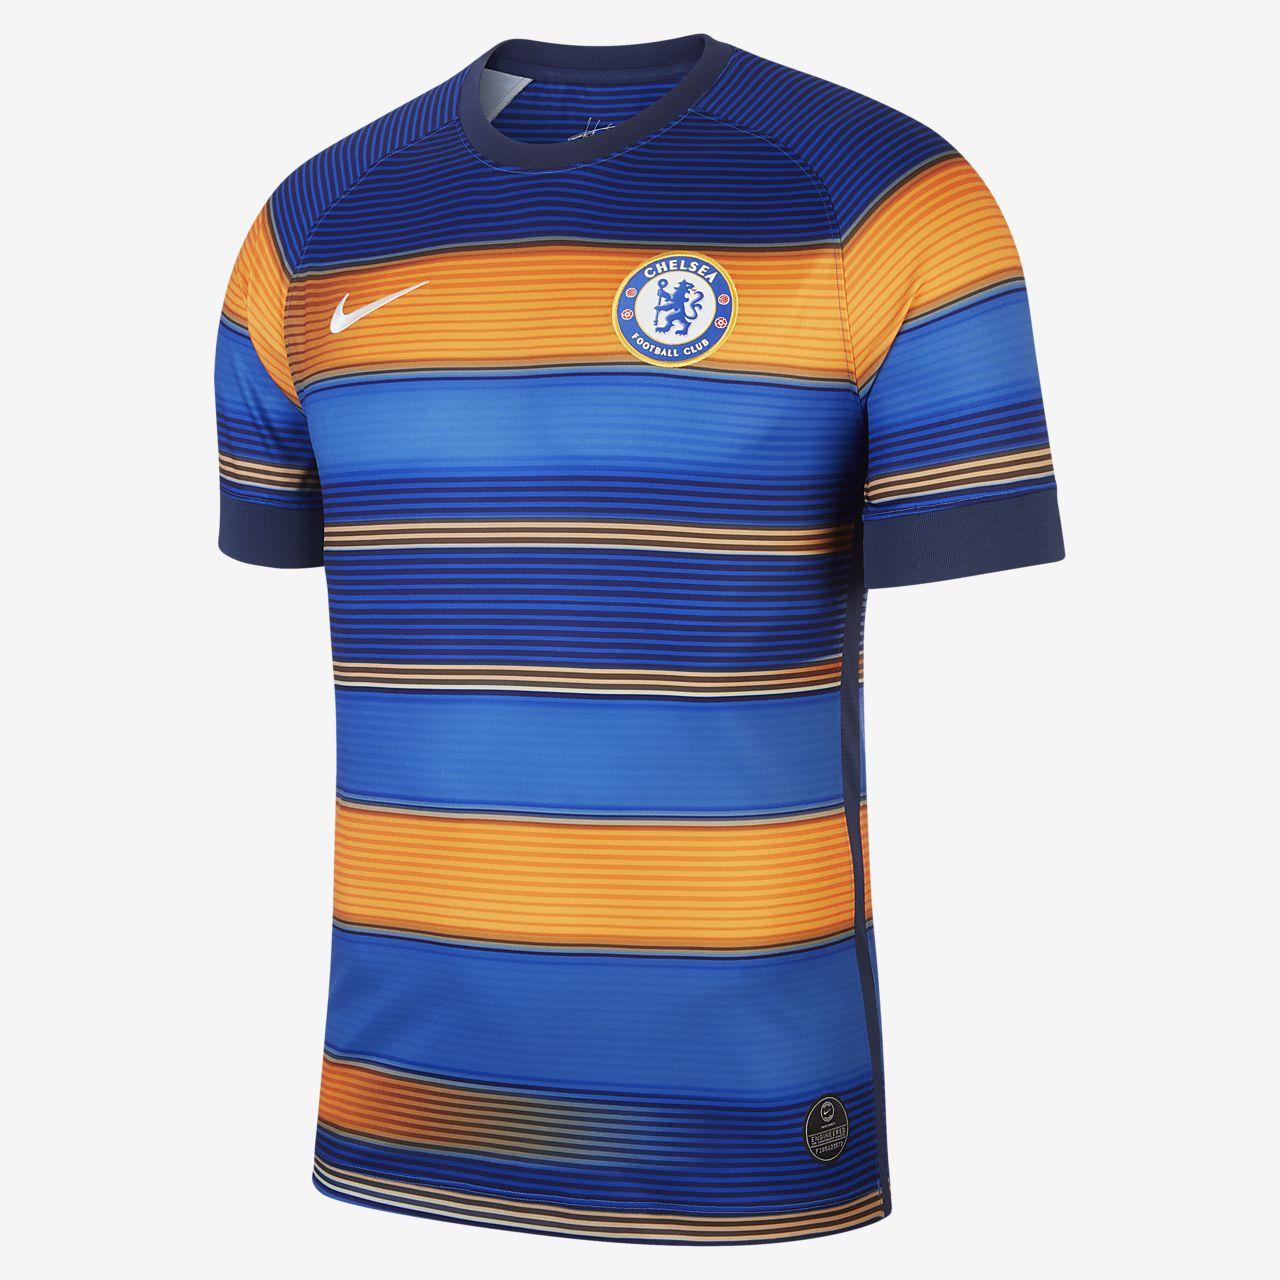 finest selection 2413e 5f0da Chelsea 2019 Nike Shirtholders Edition Shirt | 19/20 Kits ...